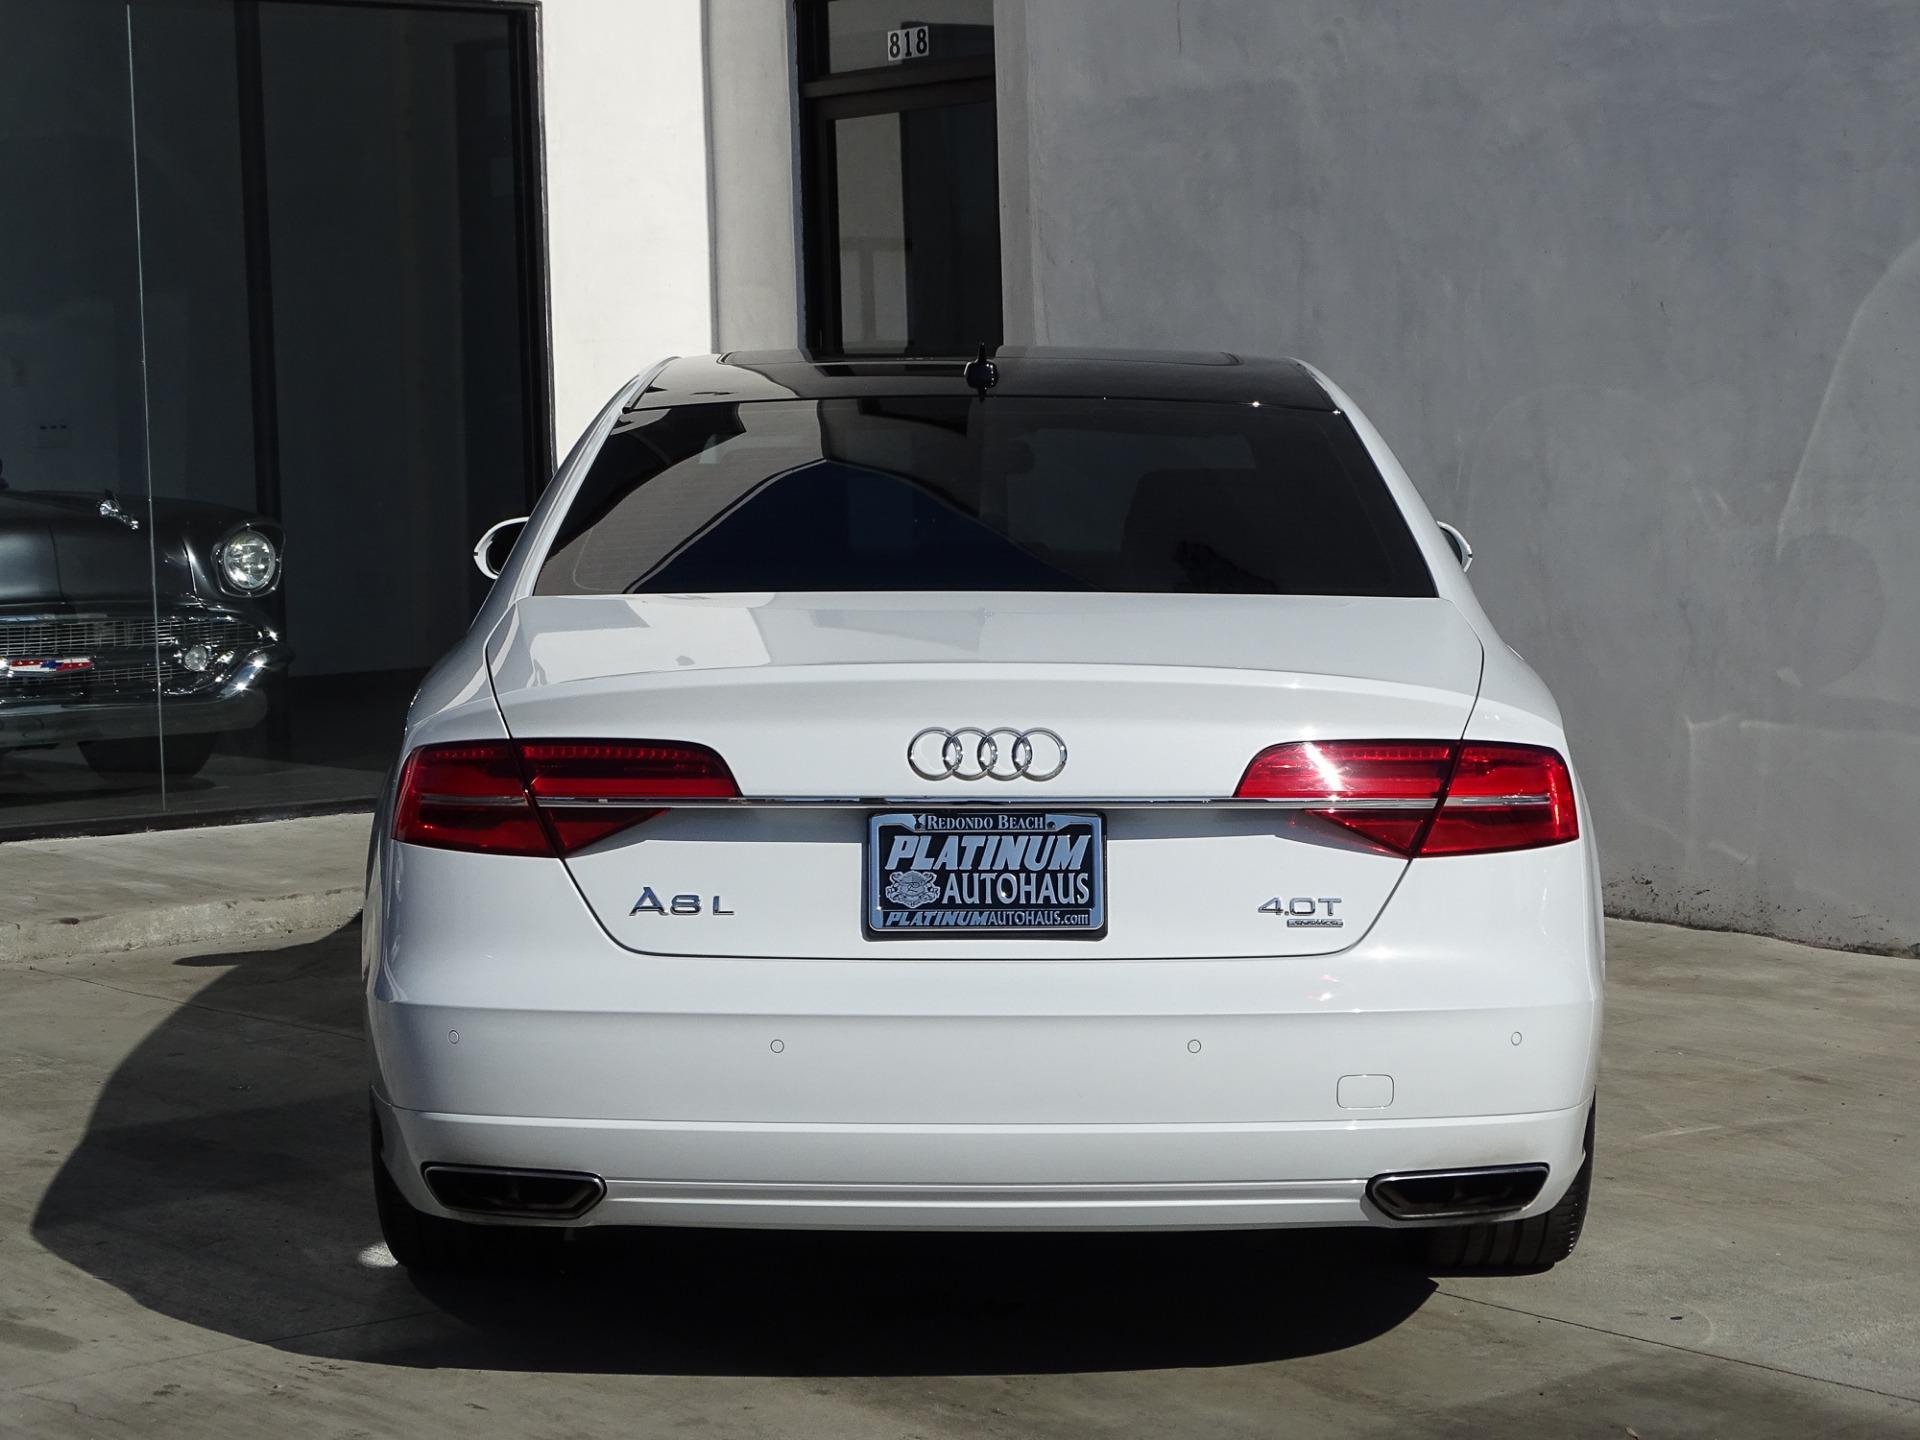 2016 Audi A8 L 4.0T quattro Sport Stock # 6331 for sale near Redondo Beach, CA | CA Audi Dealer